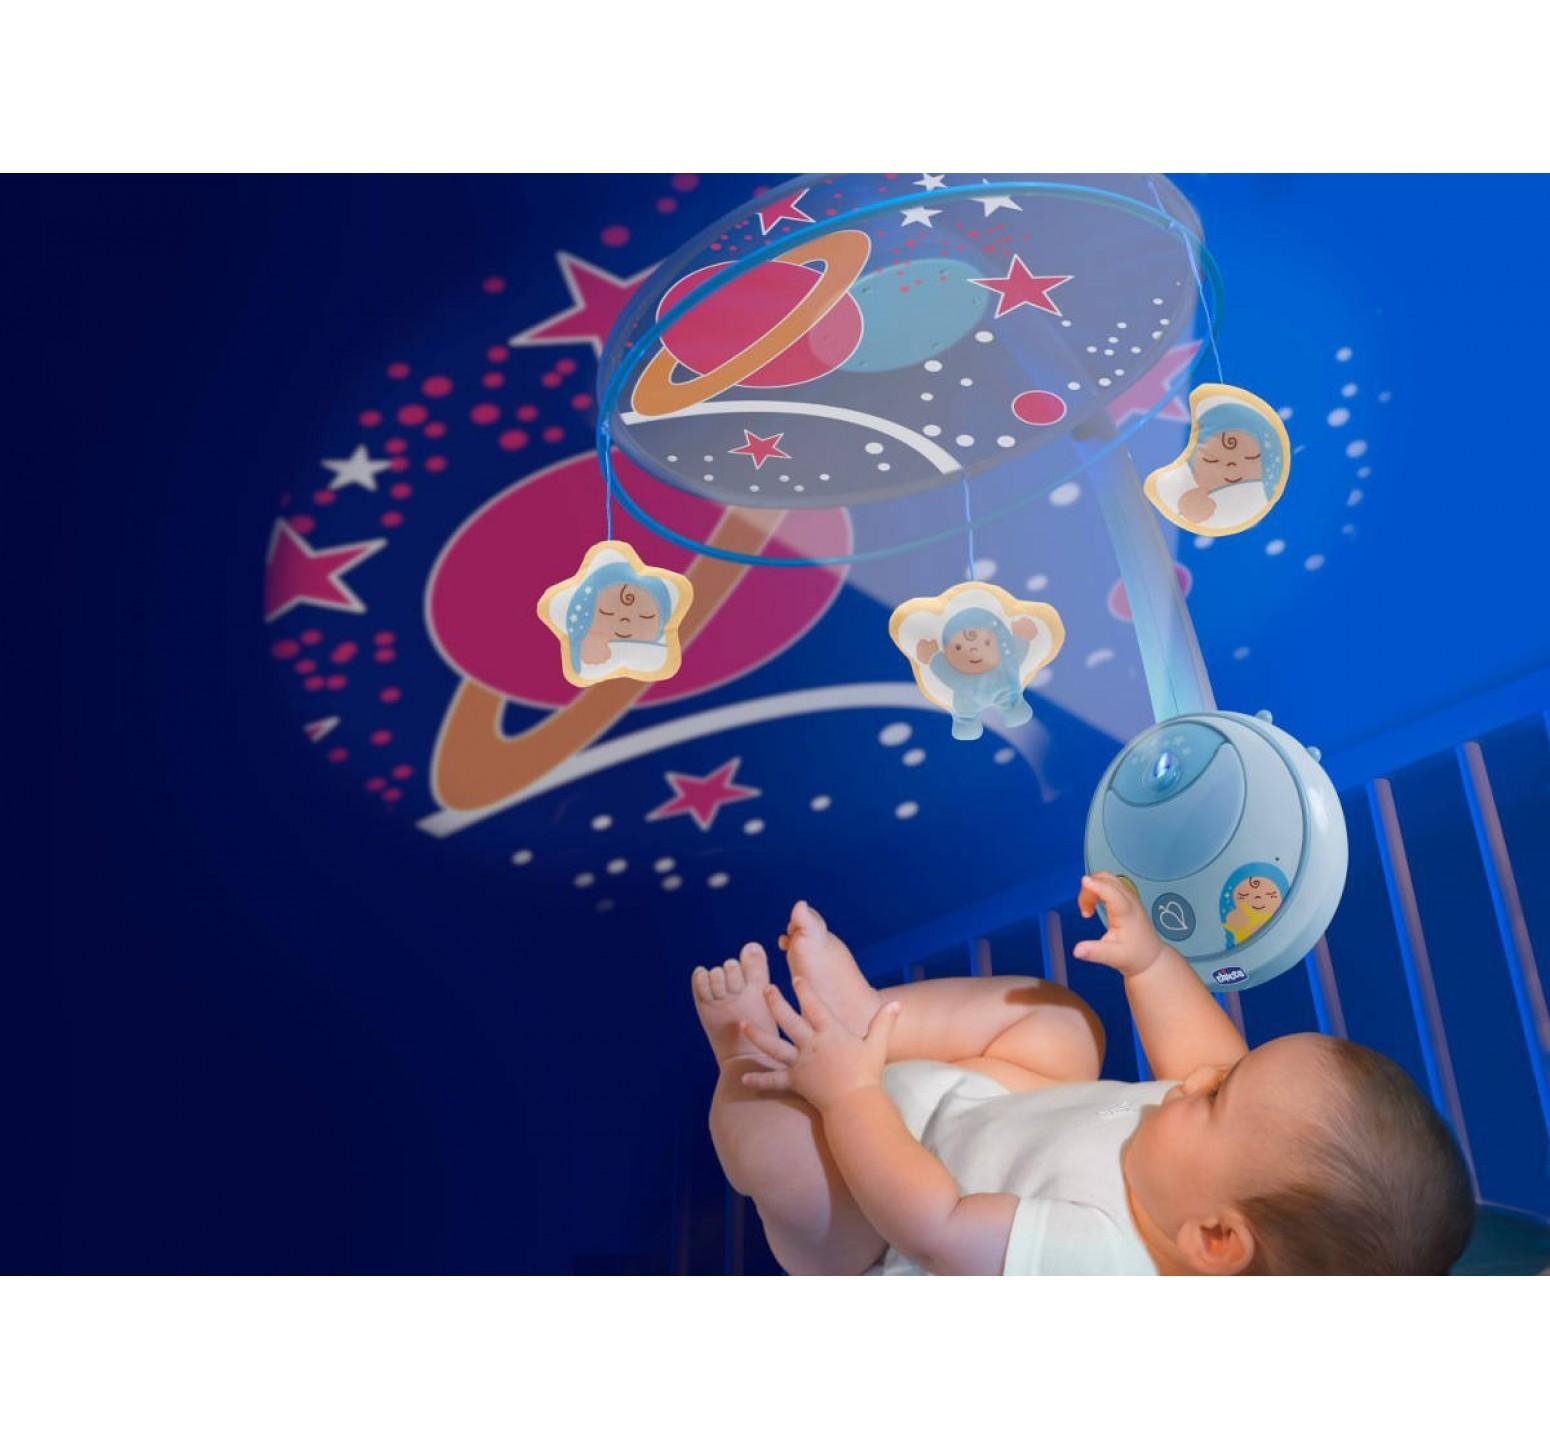 Chicco móvil estrella mágica azul